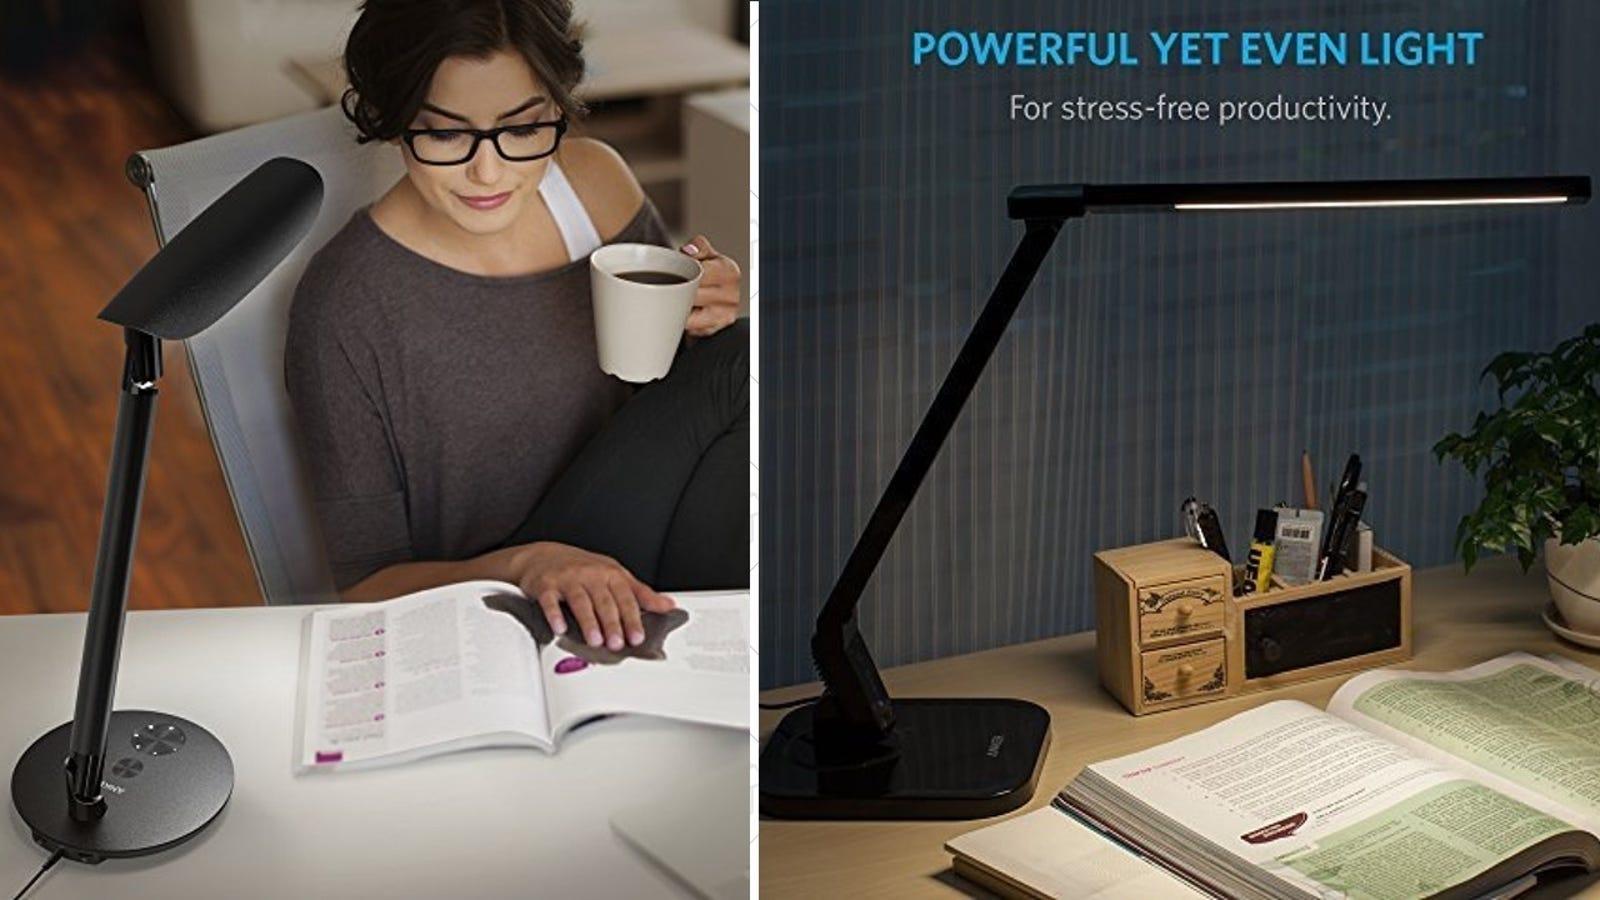 Anker S Discounted Desk Lamps Change Color Temperature